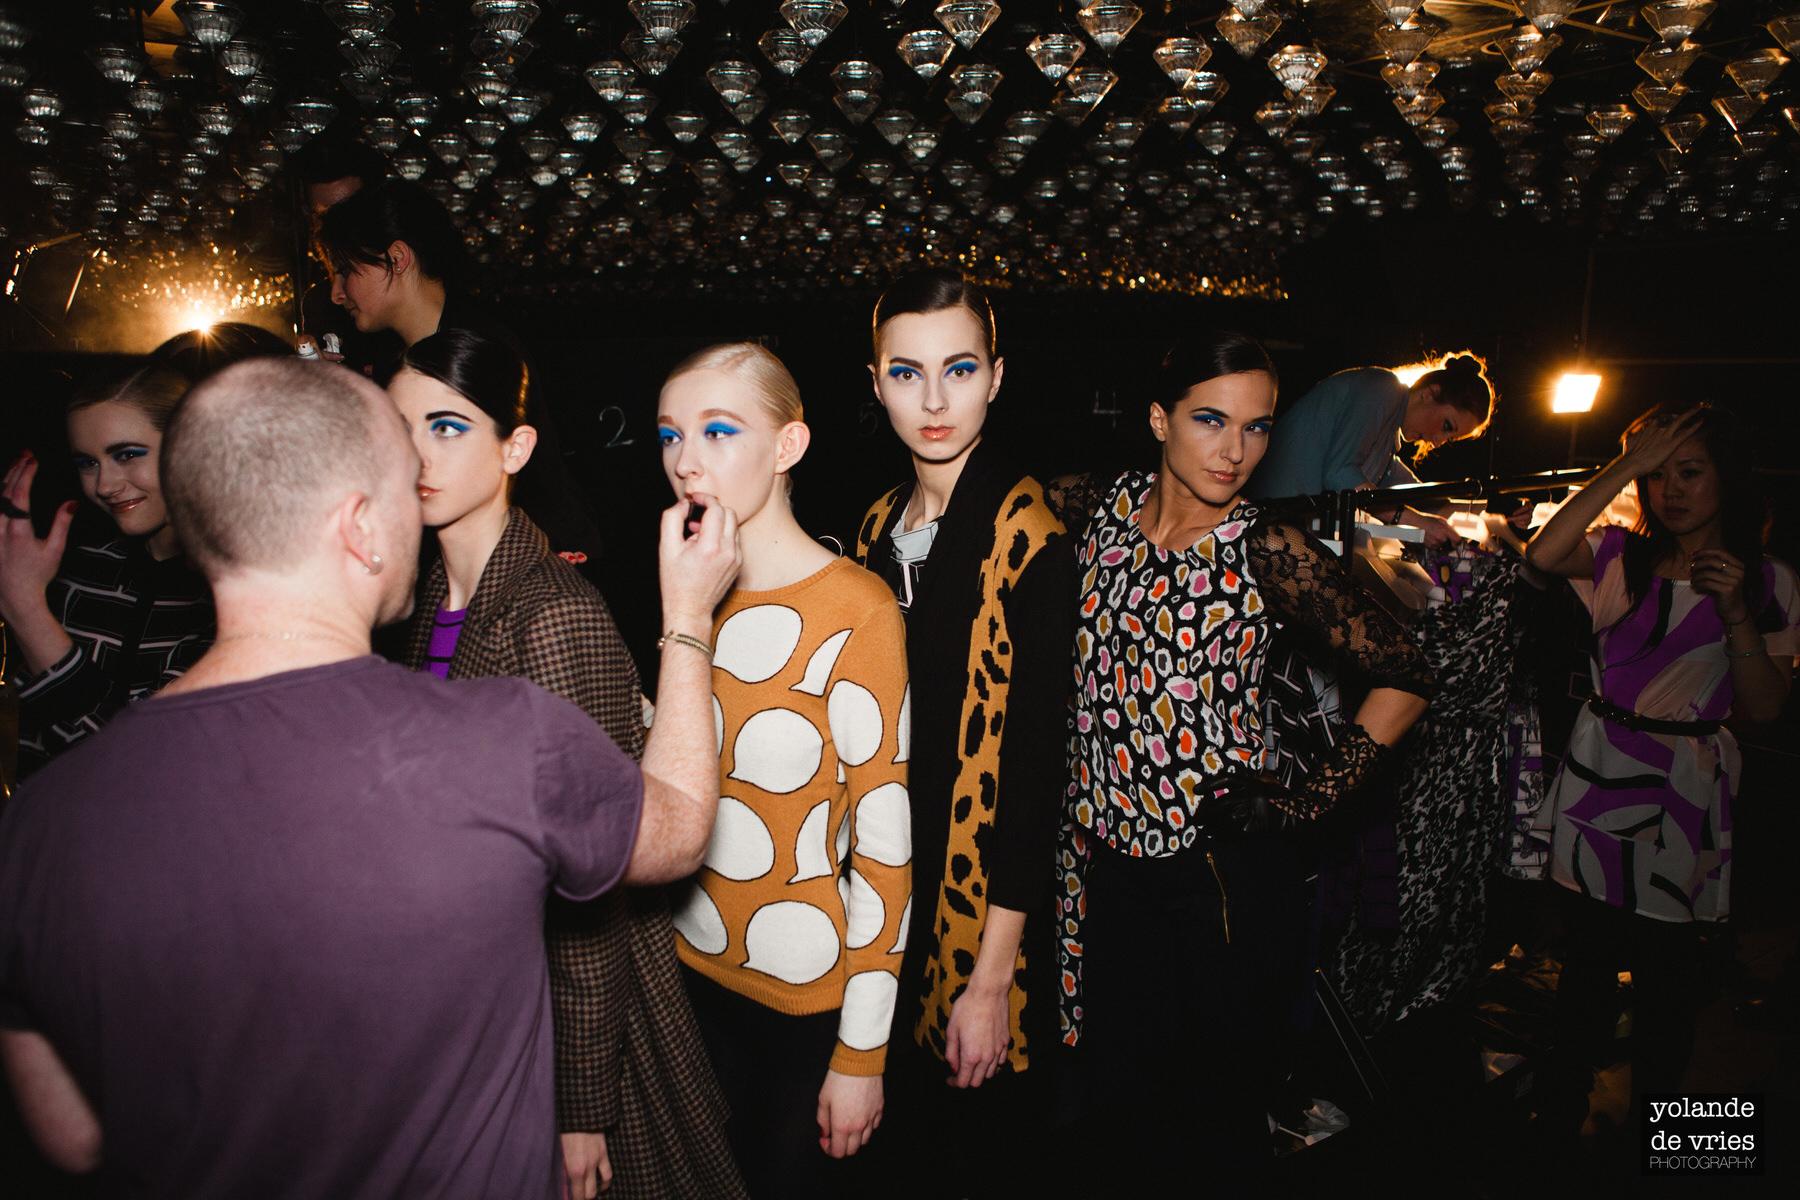 Olivia-Rubin-SS11-London-Fashion-Week-1673.jpg